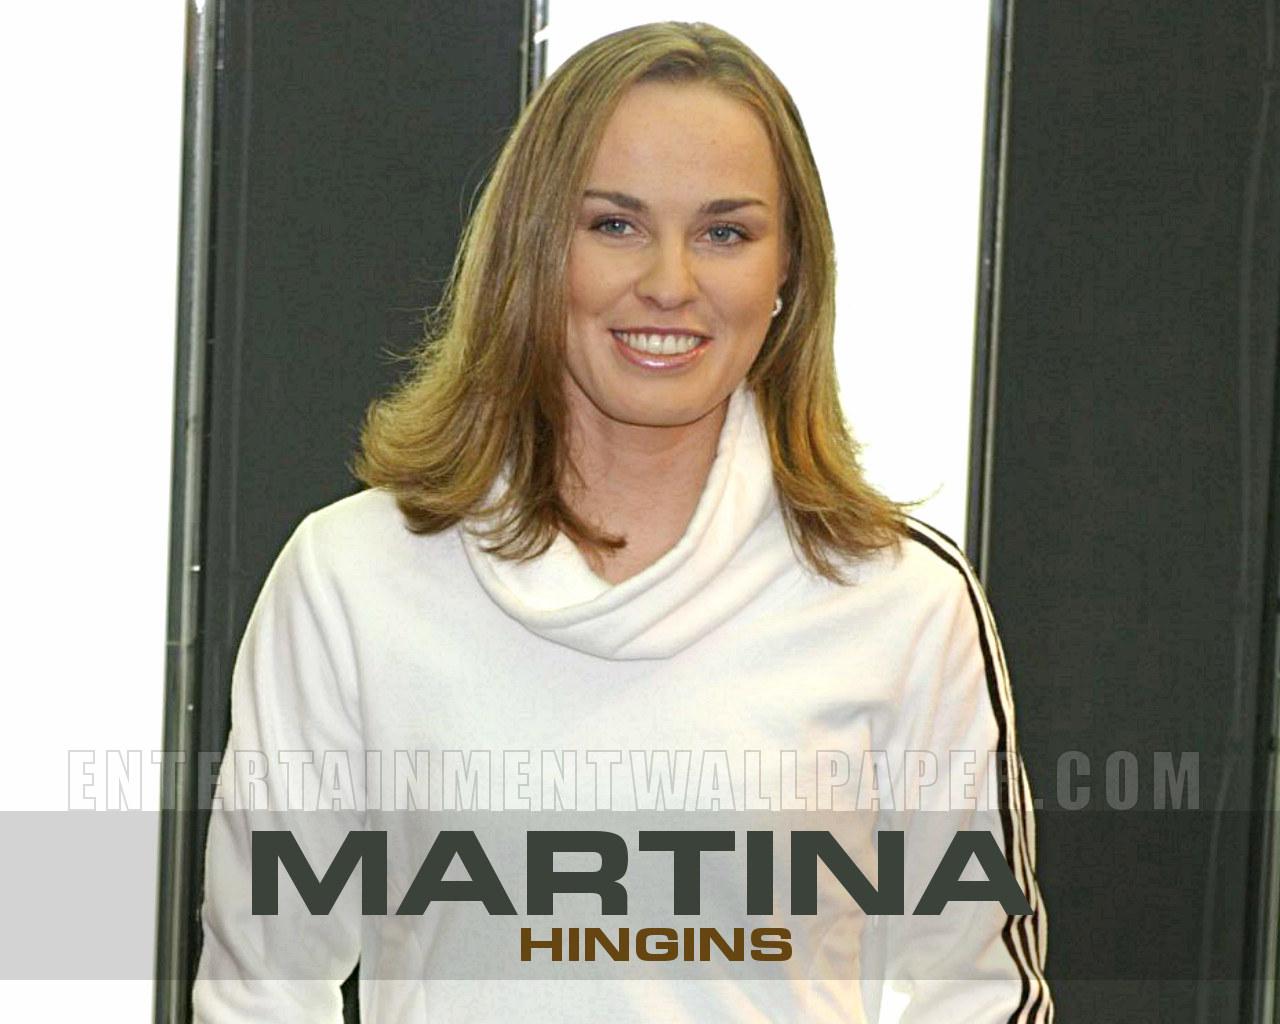 world sports Martina hingis wallpaper 1280x1024